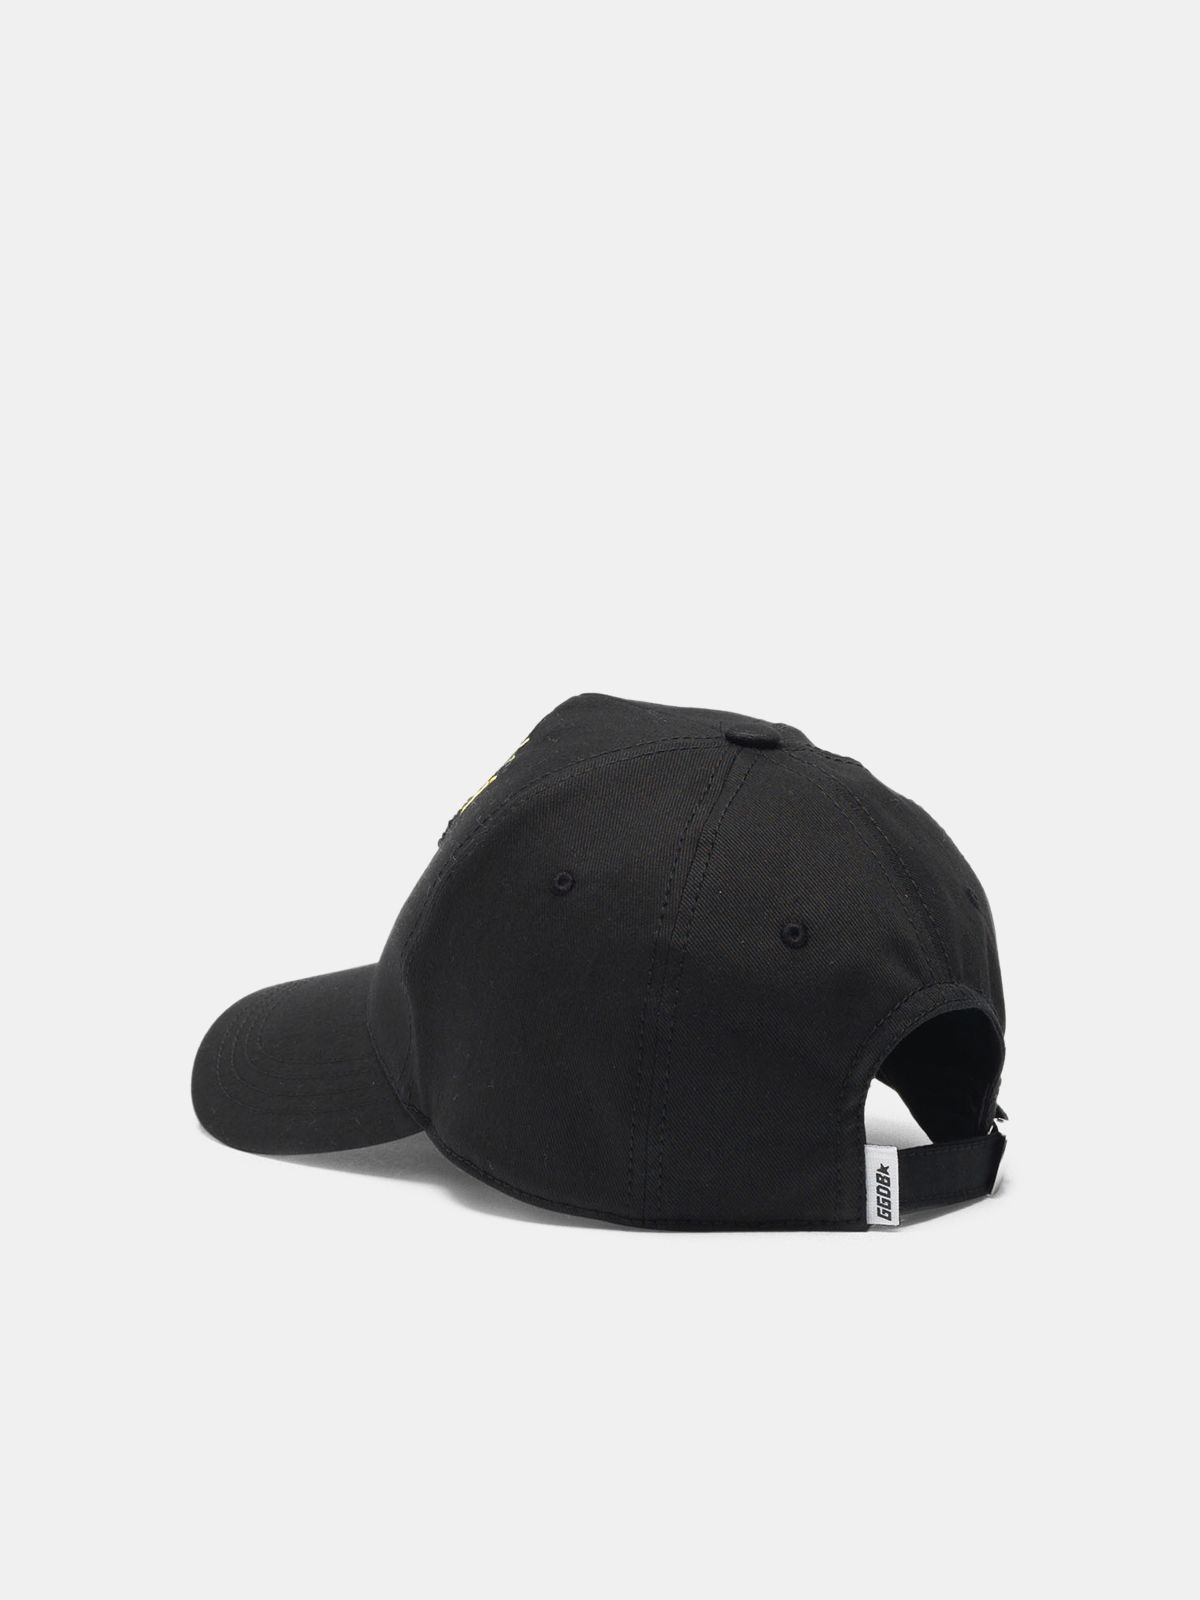 Golden Goose - Cappellino da baseball Larry nero con logo in